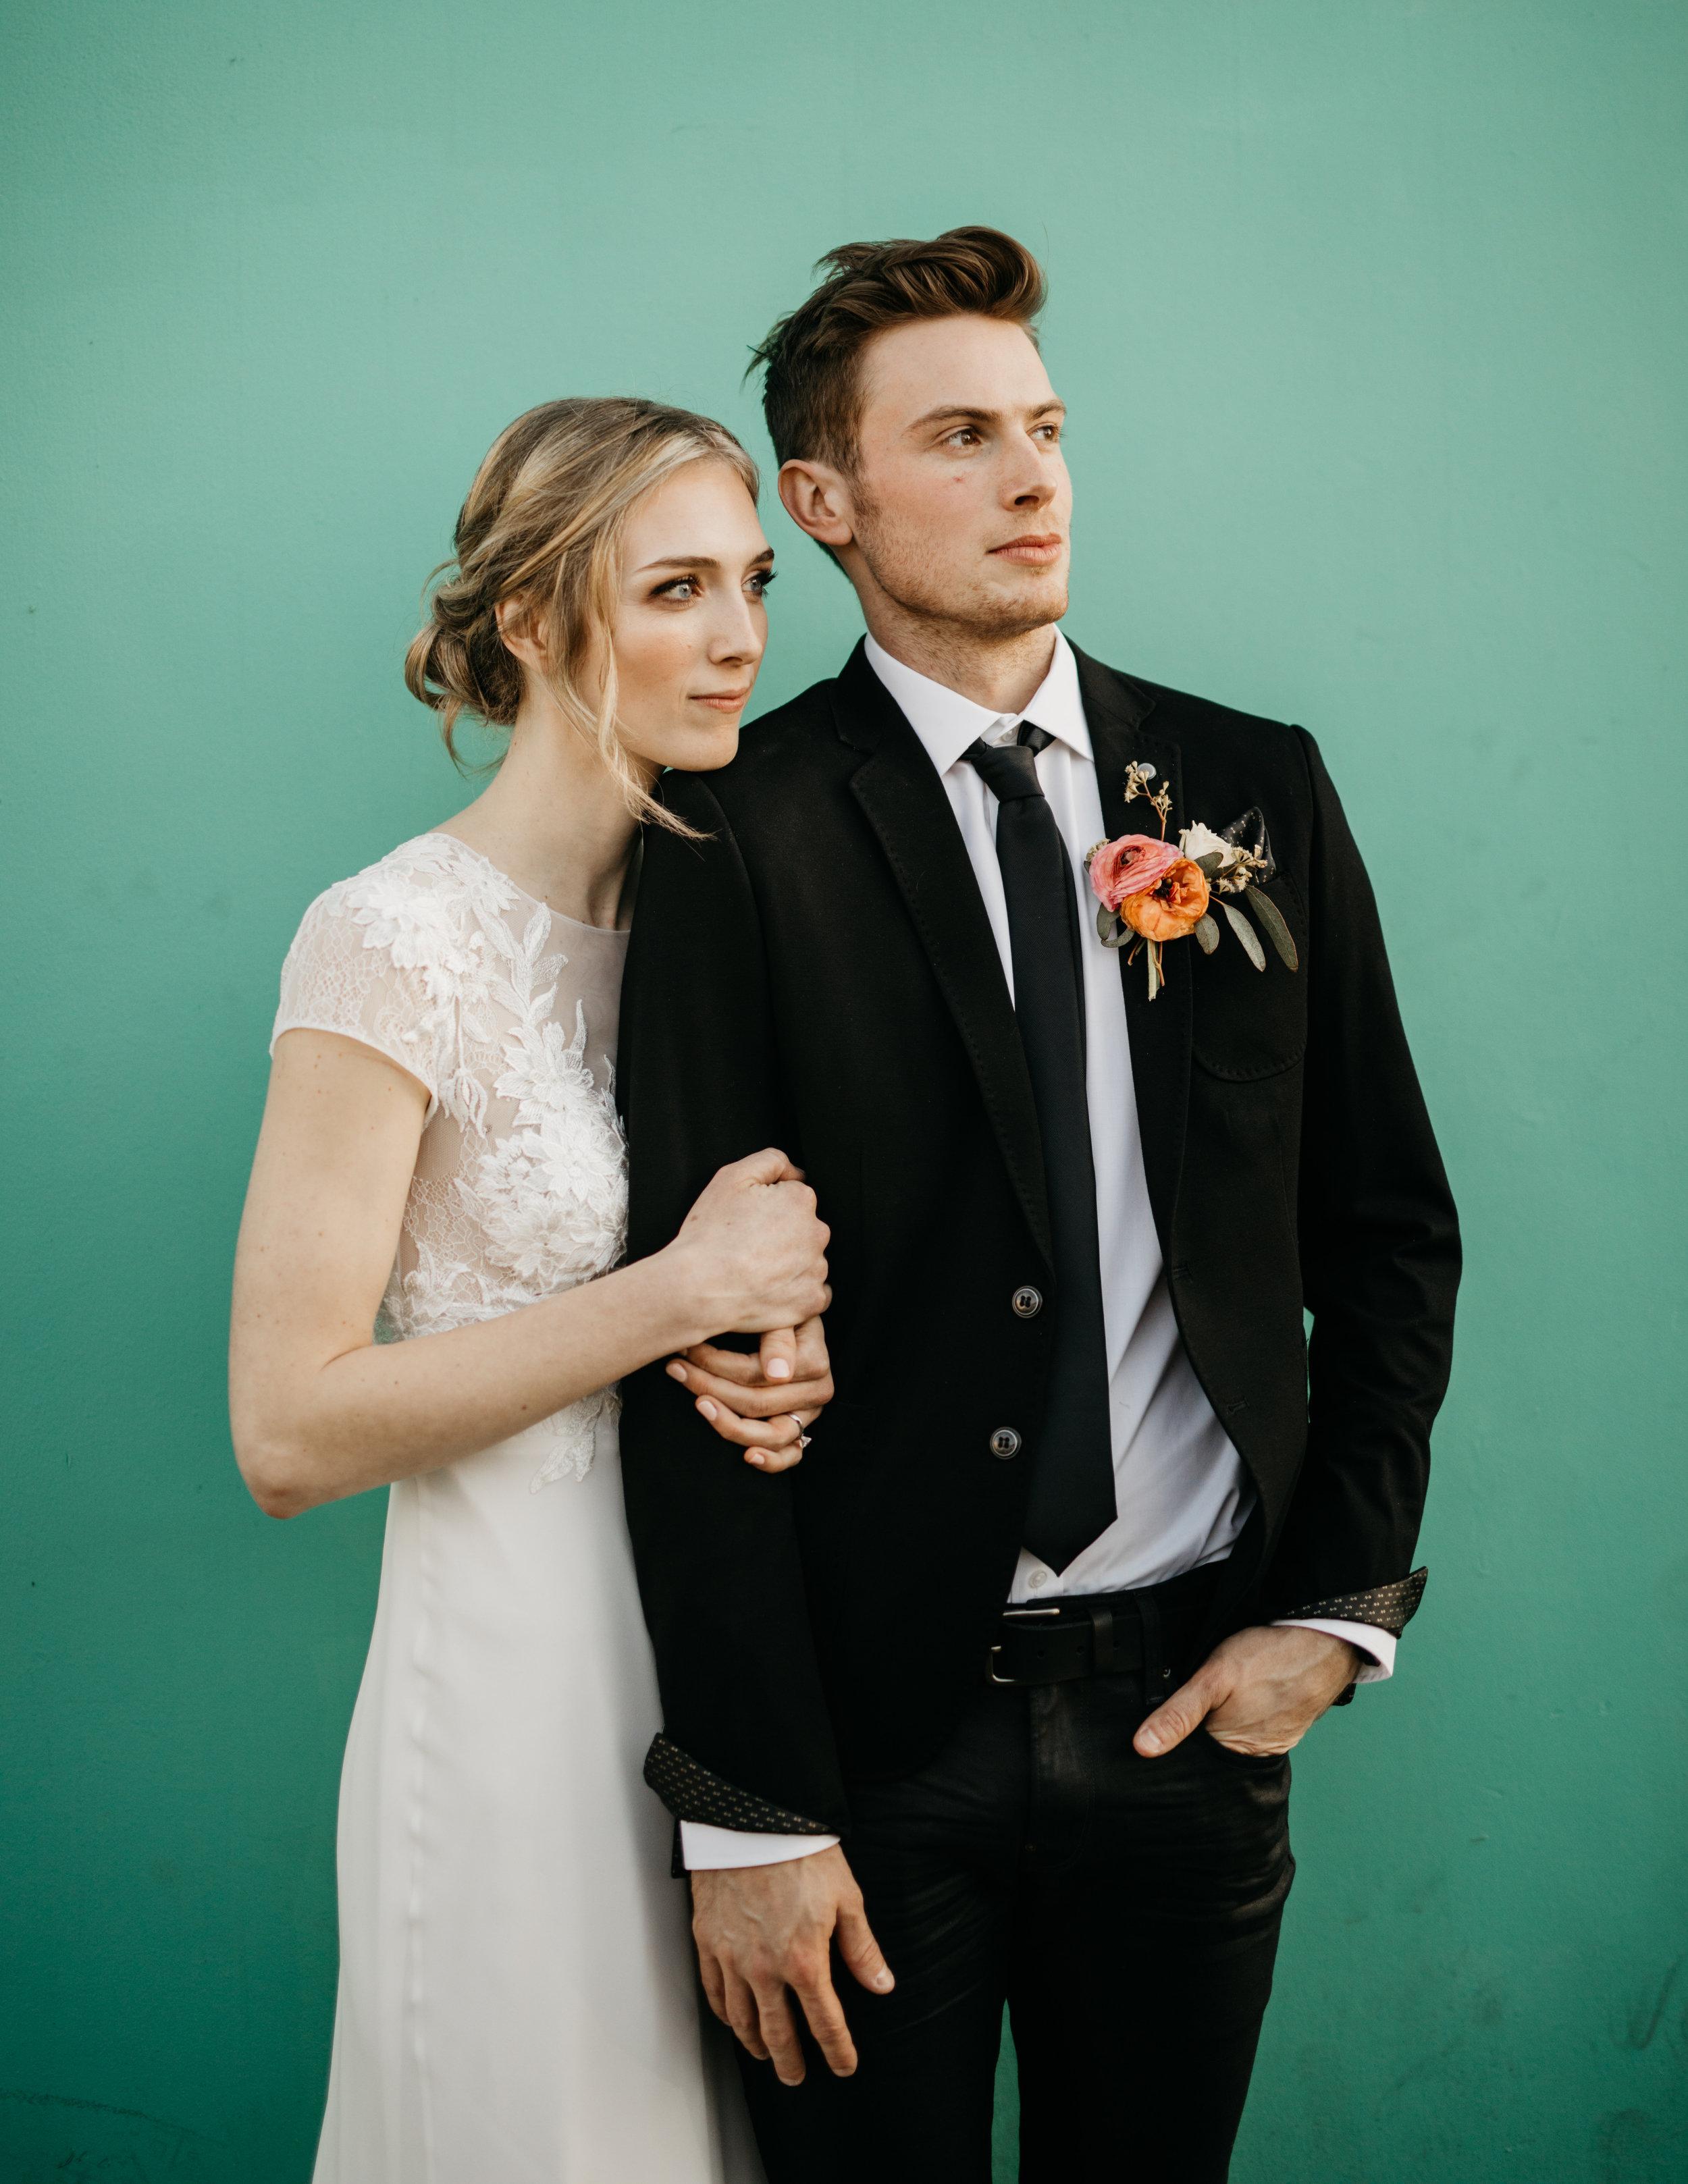 PHOTON STUDIO WEDDING | PORTLAND OREGON -